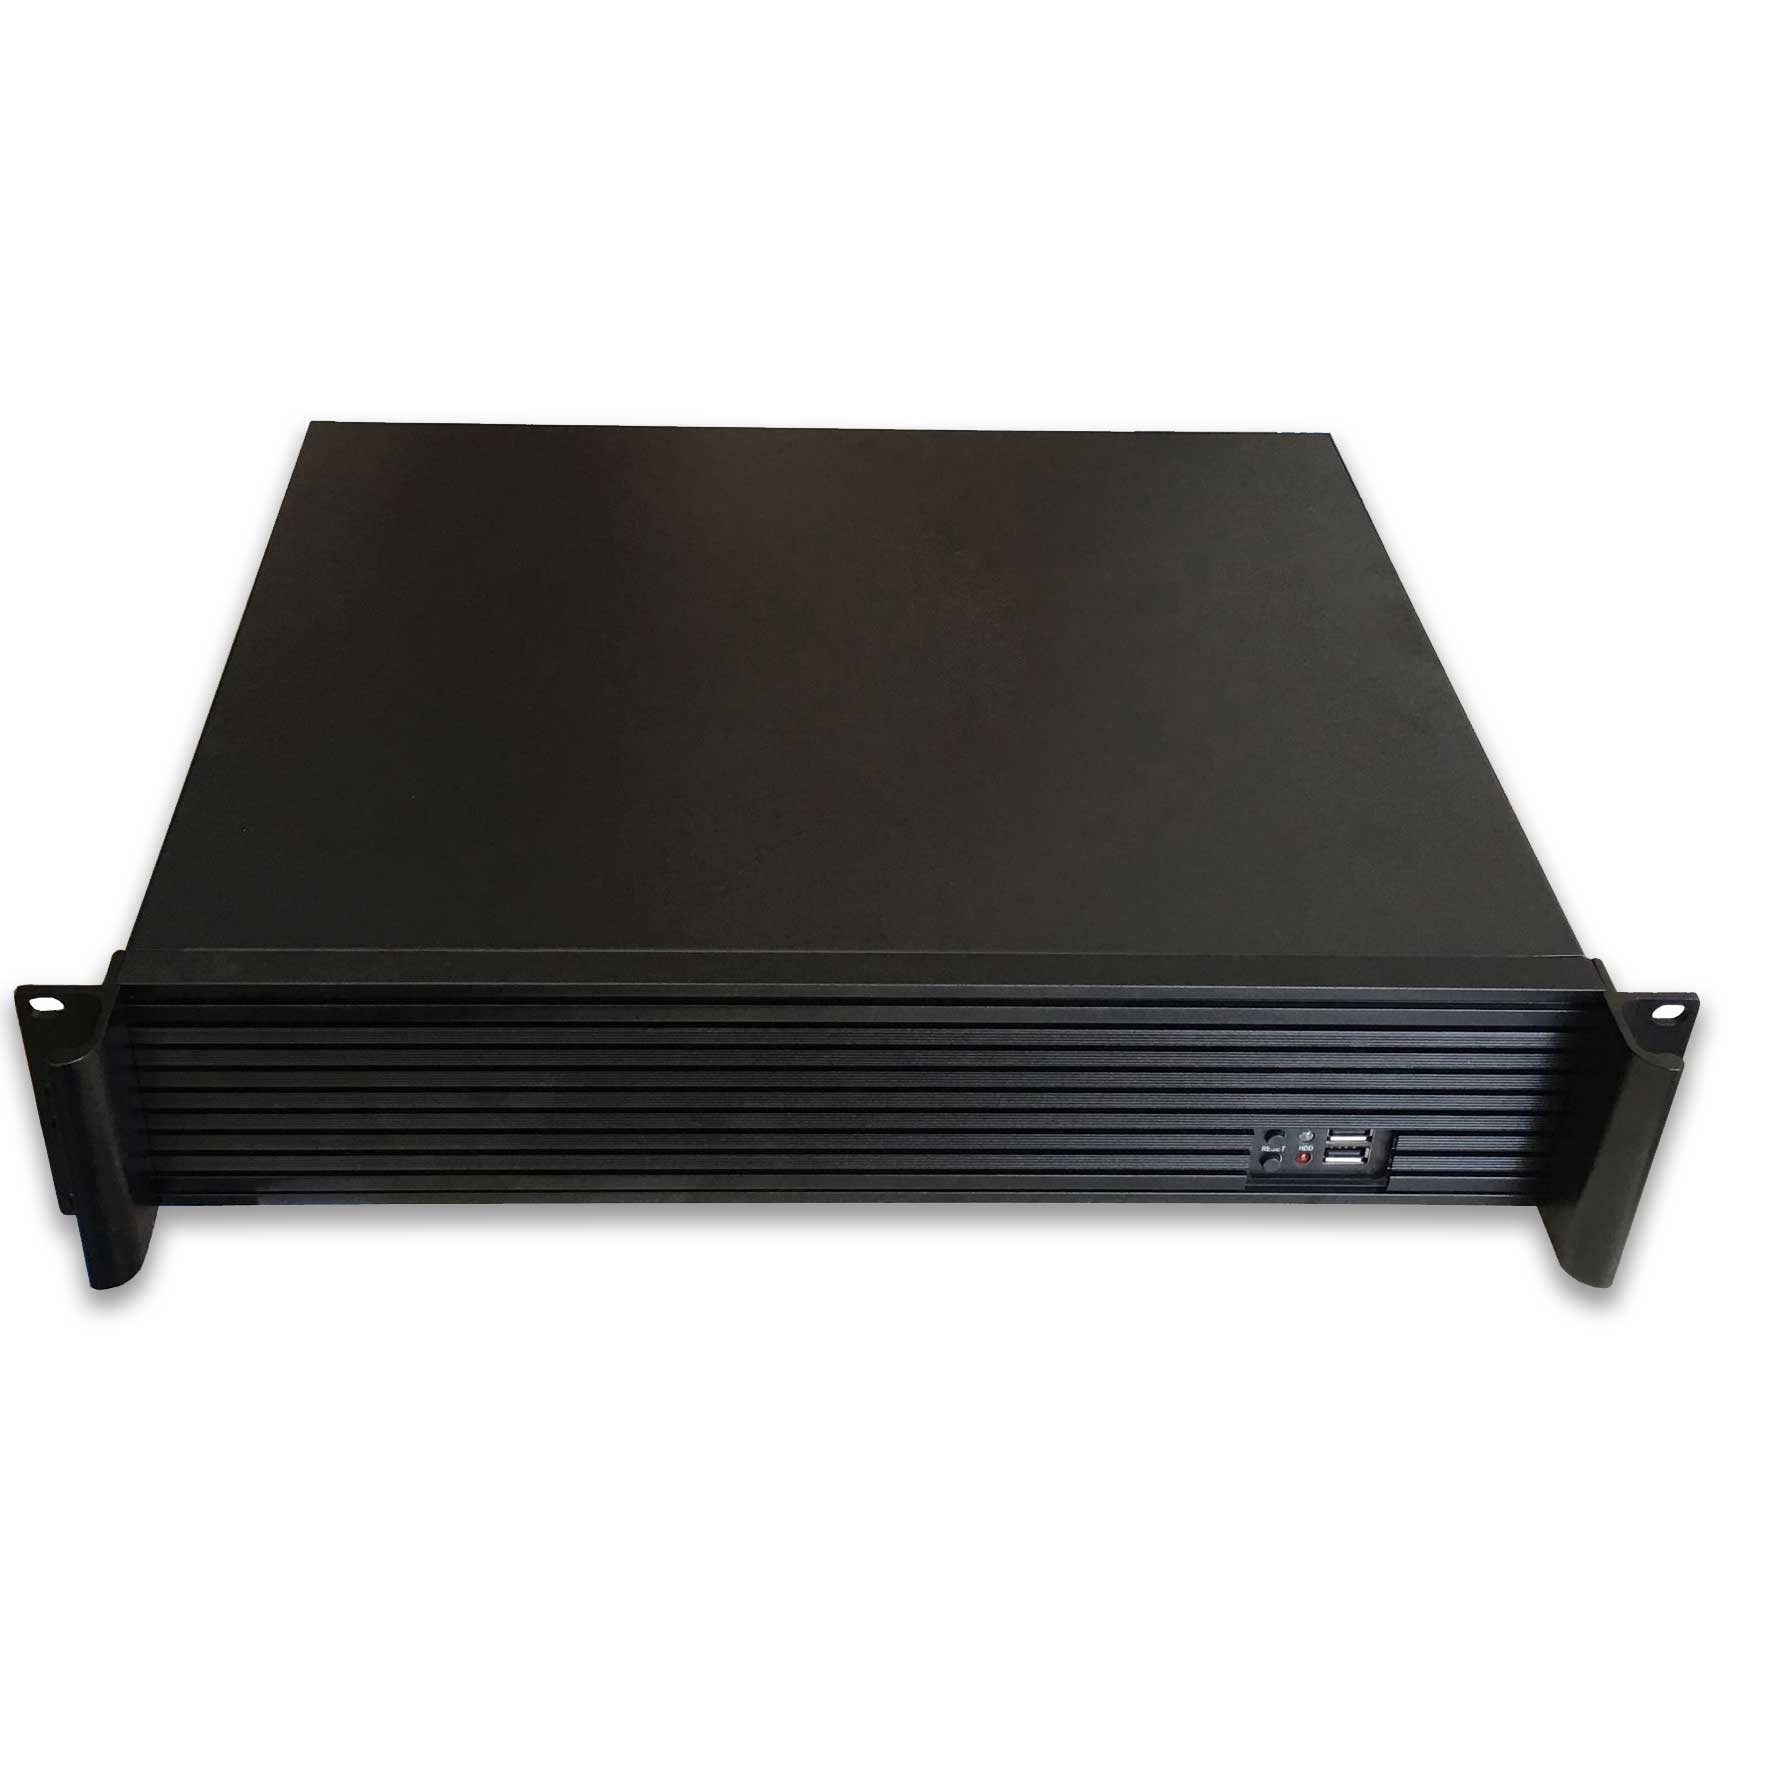 TGC Rack Mountable Server Chassis 2U 350mm Depth, 3x Int 3.5' Bays, 4x Low Profile PCIE Slots, ATX PSU/MB